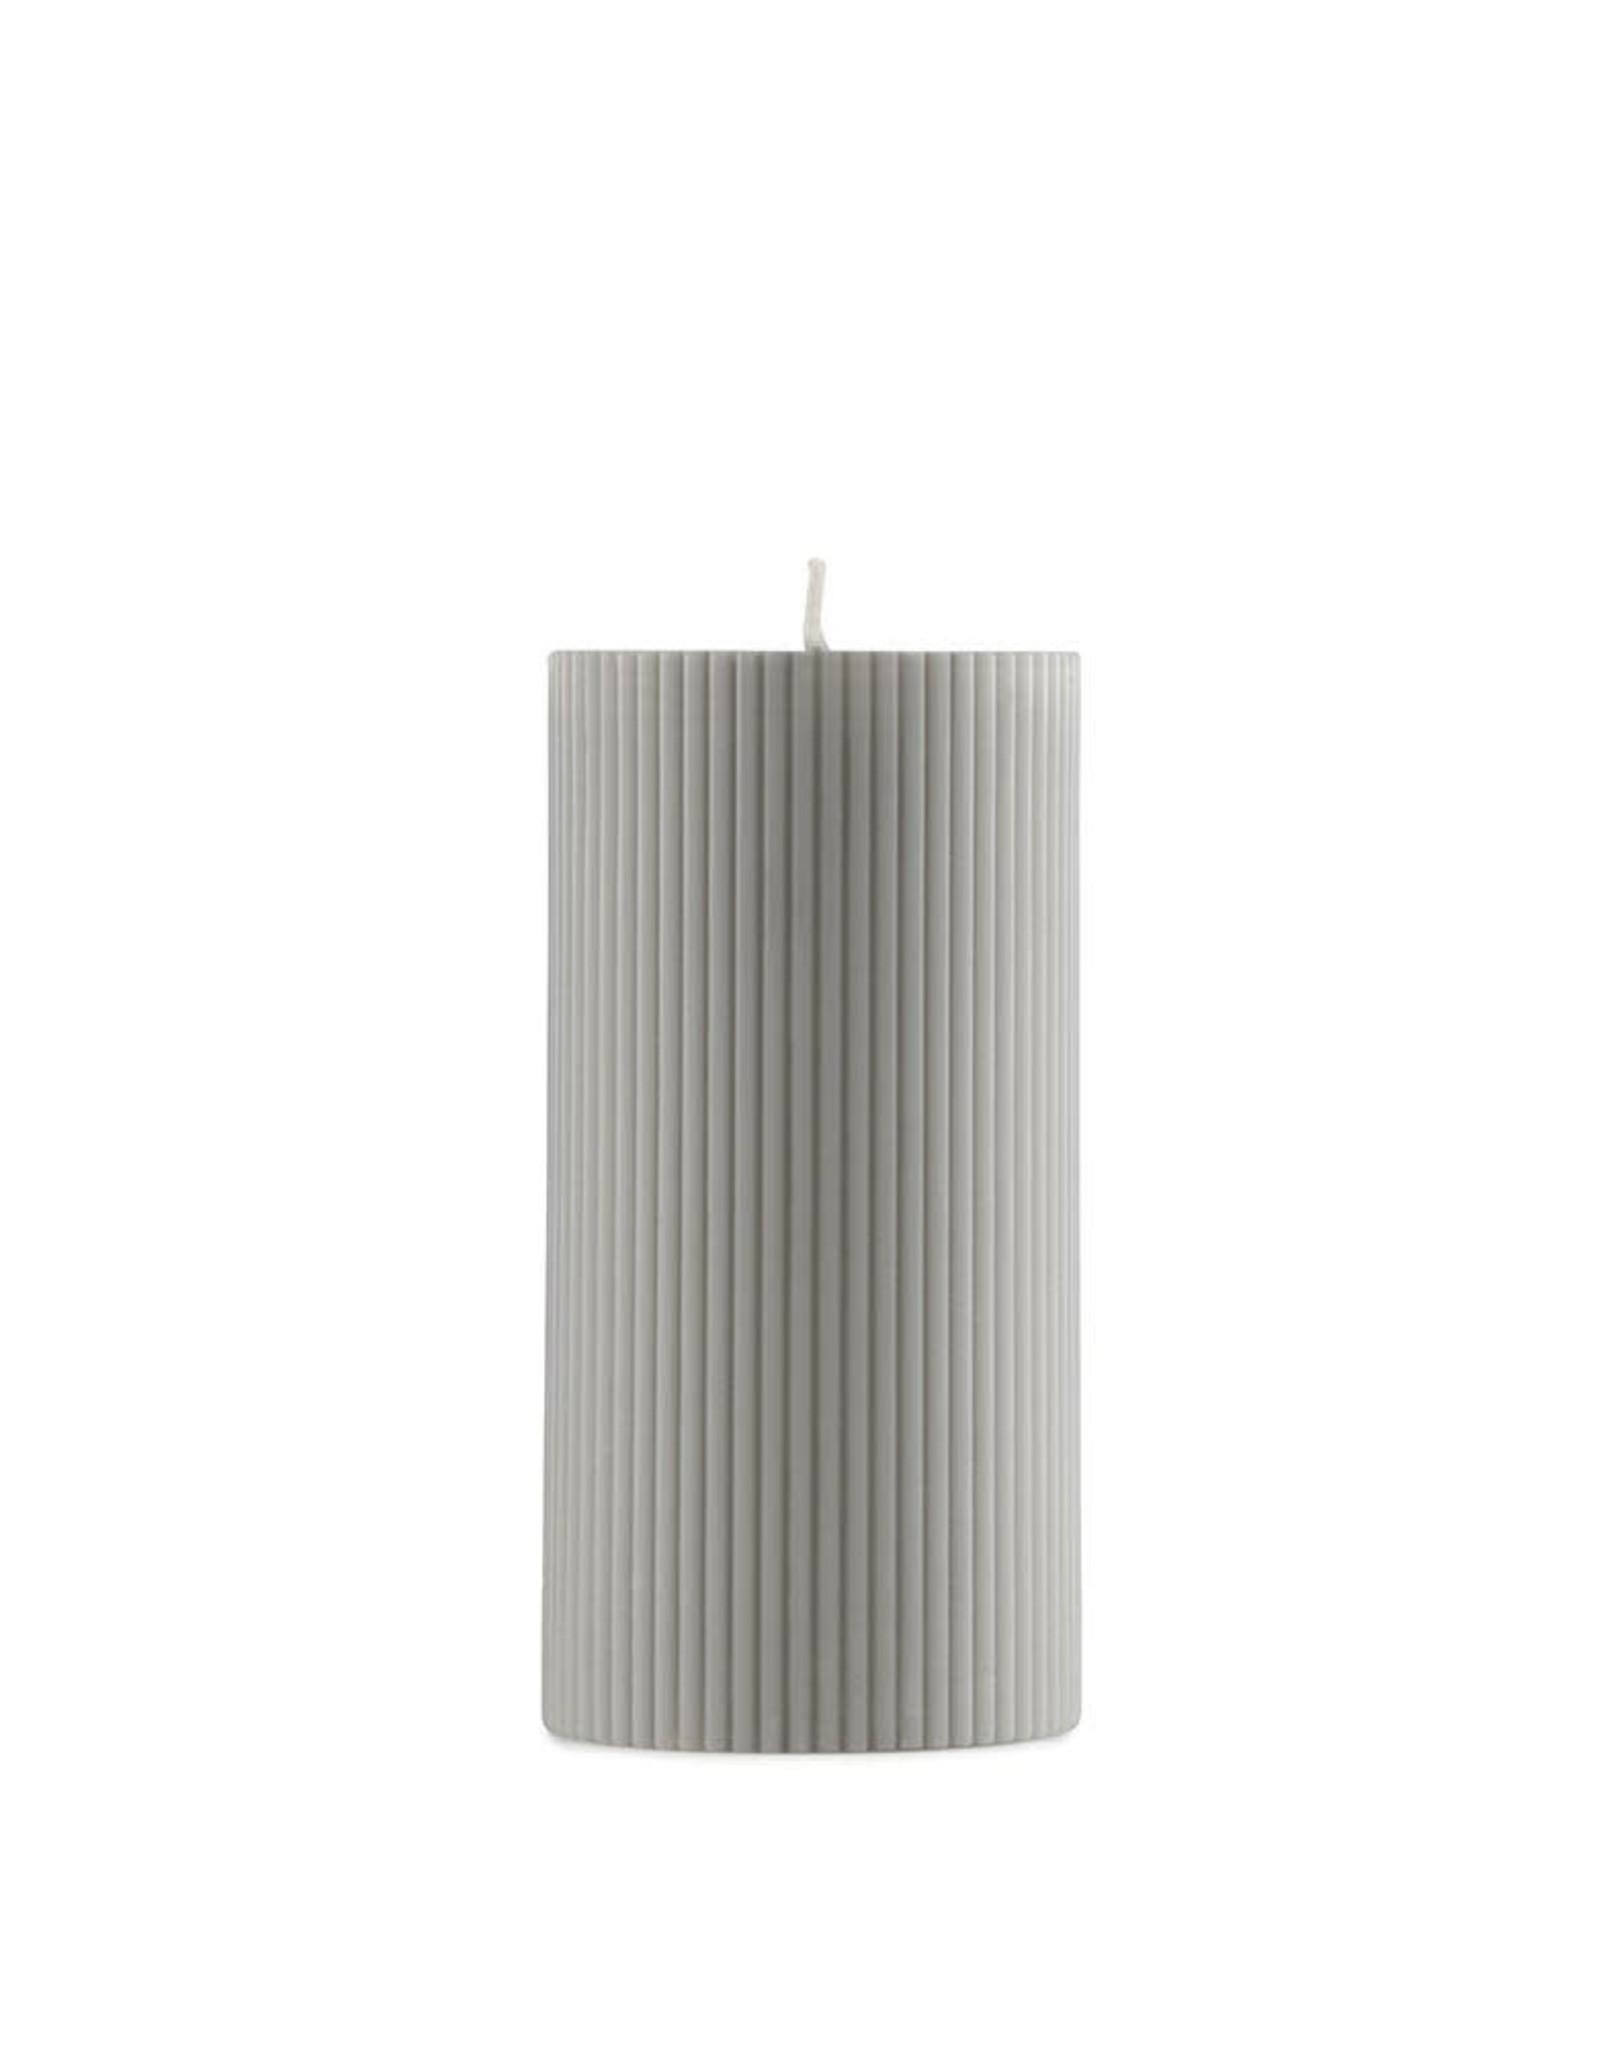 Normann Copenhagen Normann Grooved Block Candle Grey